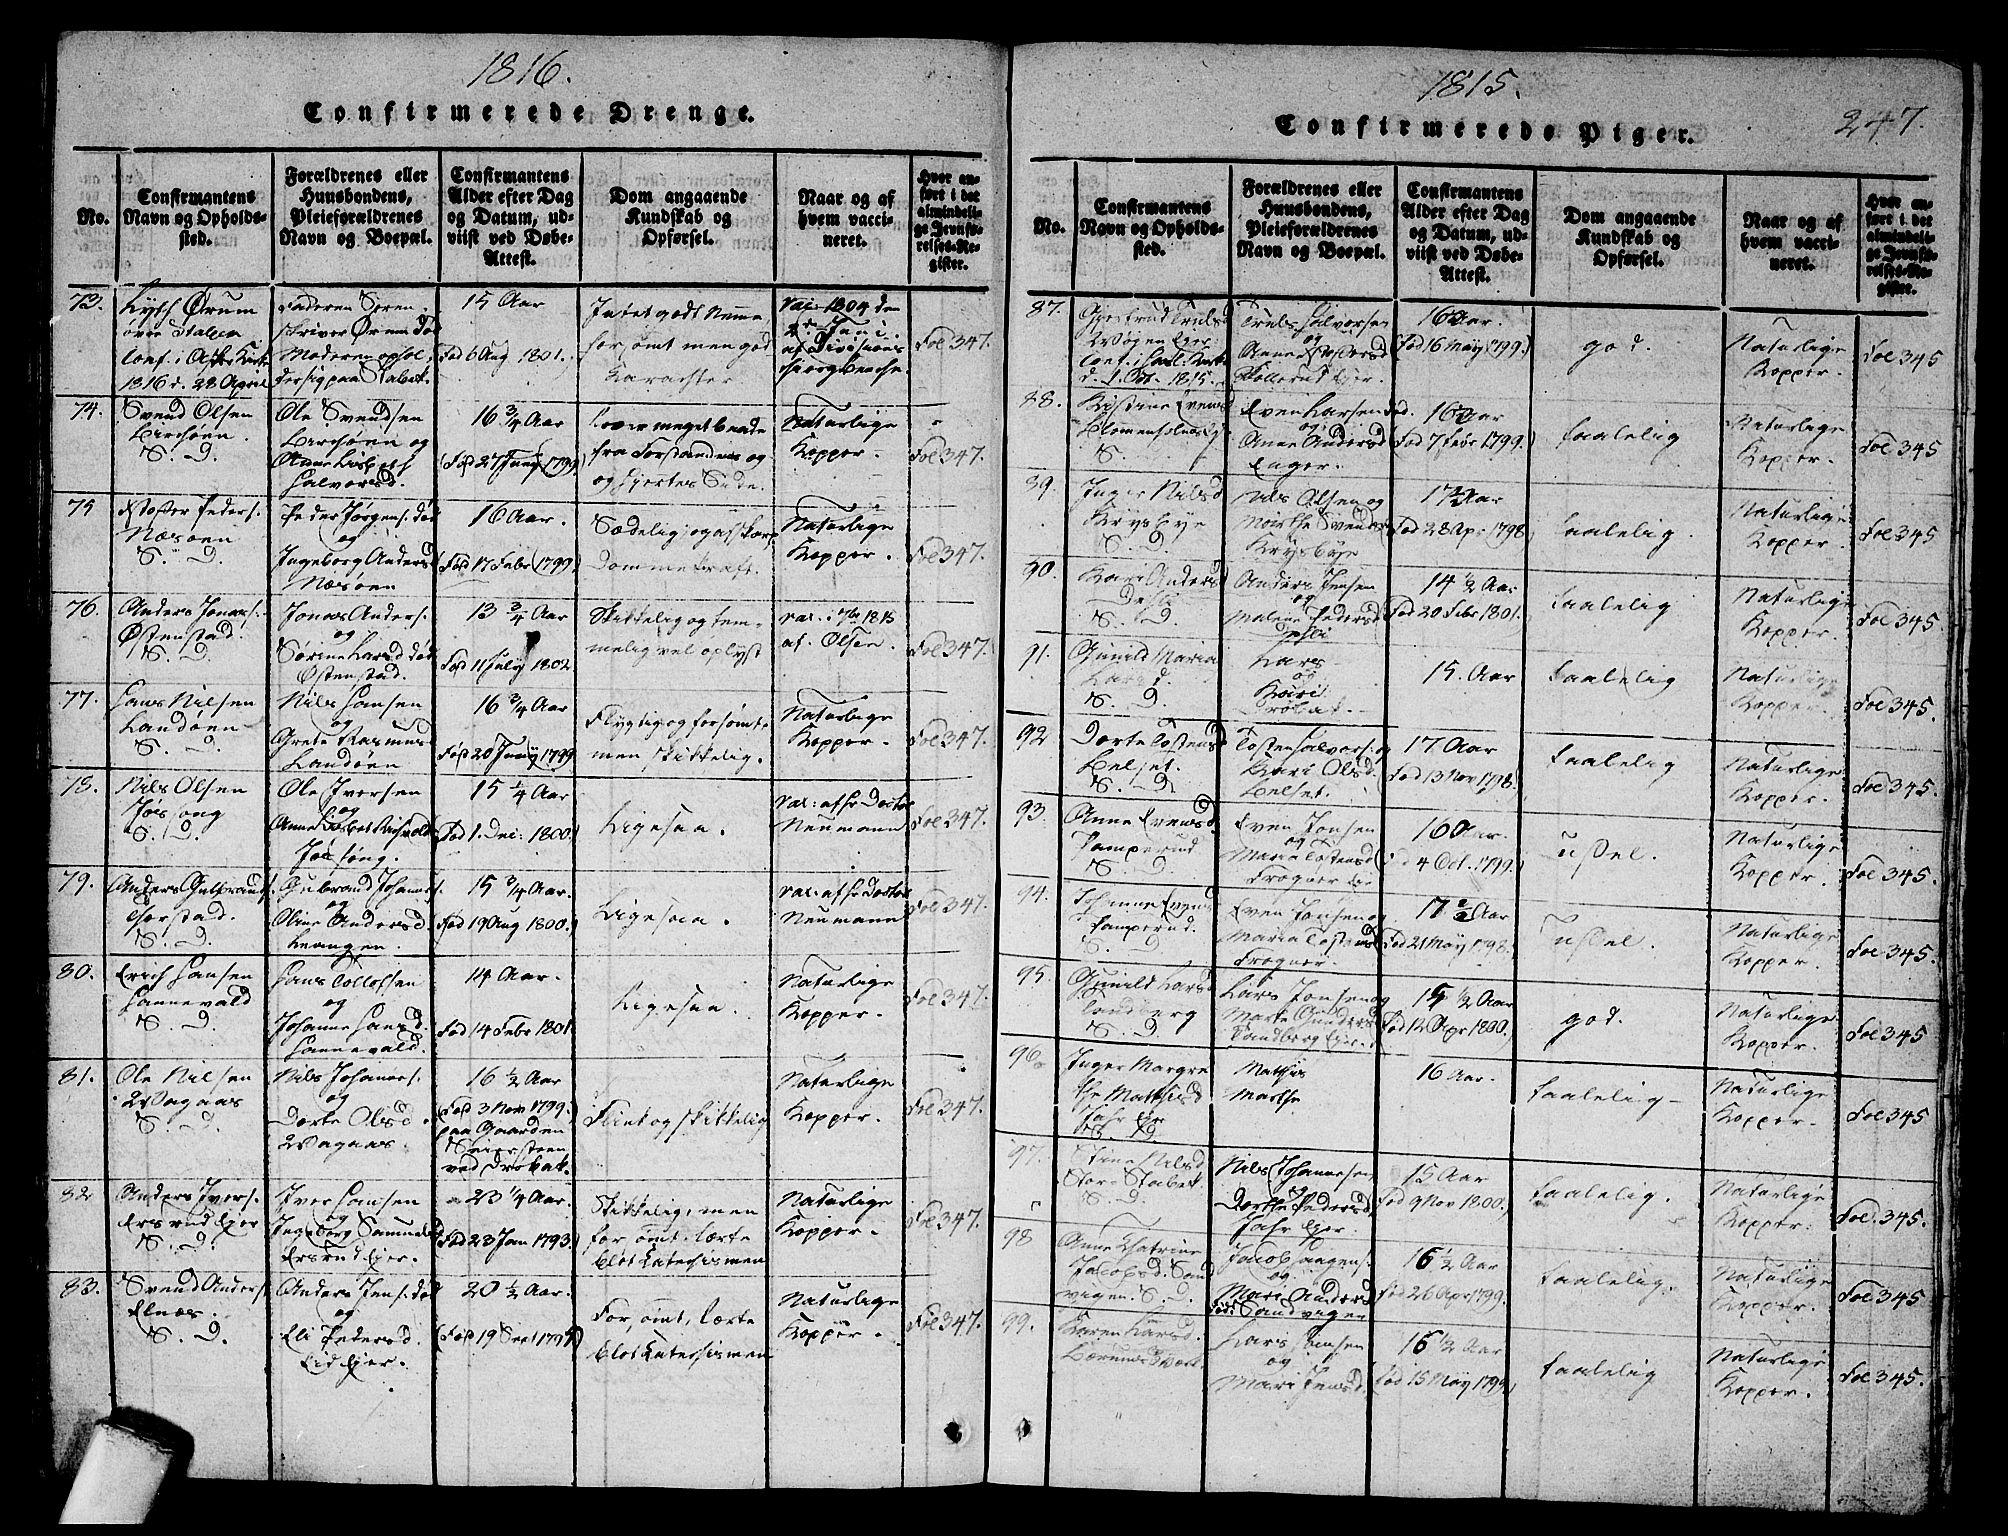 SAO, Asker prestekontor Kirkebøker, G/Ga/L0001: Klokkerbok nr. I 1, 1814-1830, s. 247